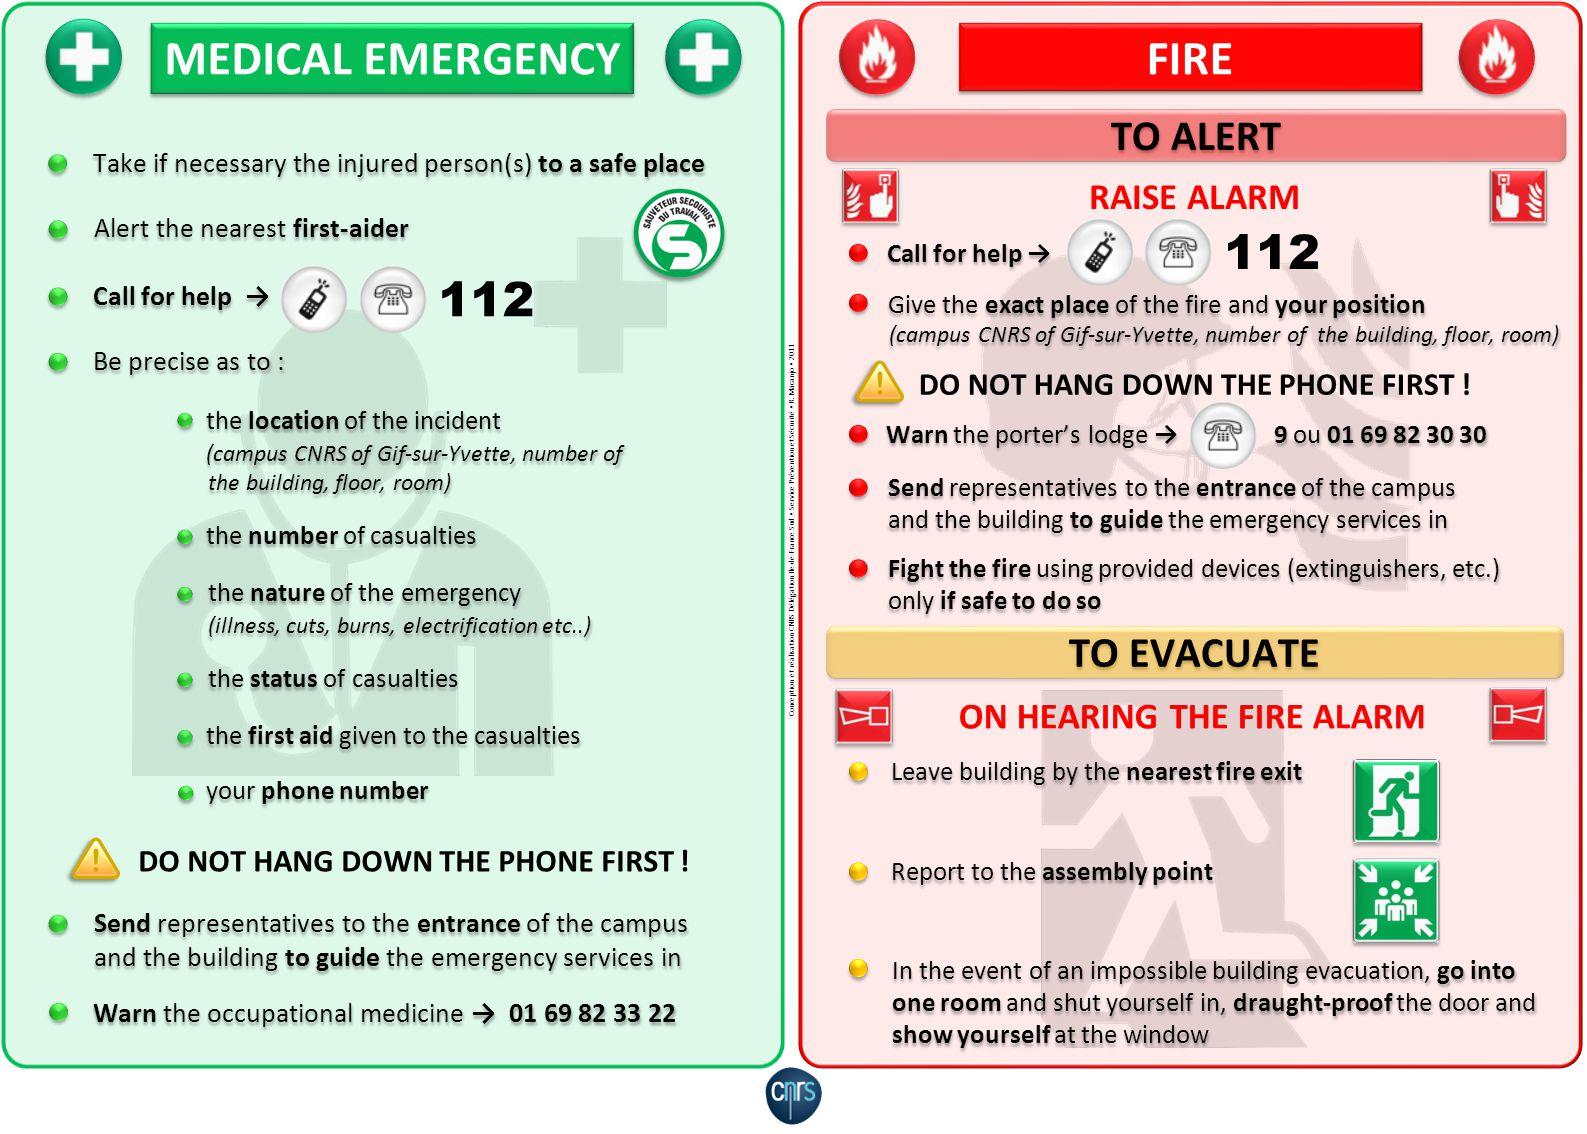 MEDICAL EMERGENCY FIRE